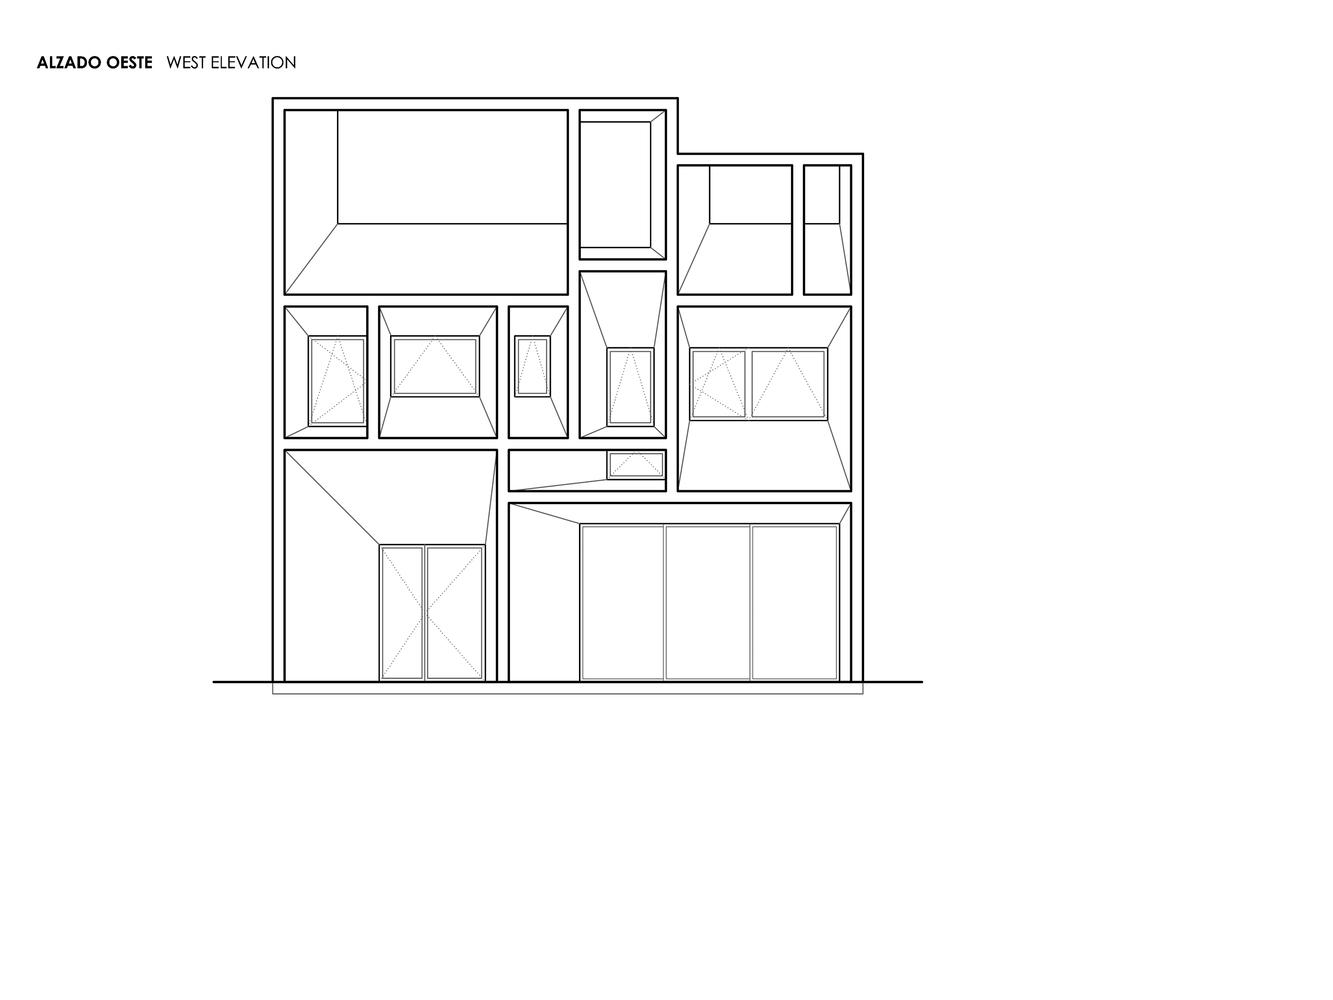 Mặt bằng biệt thự 300m2 - Brise Soleil House 1